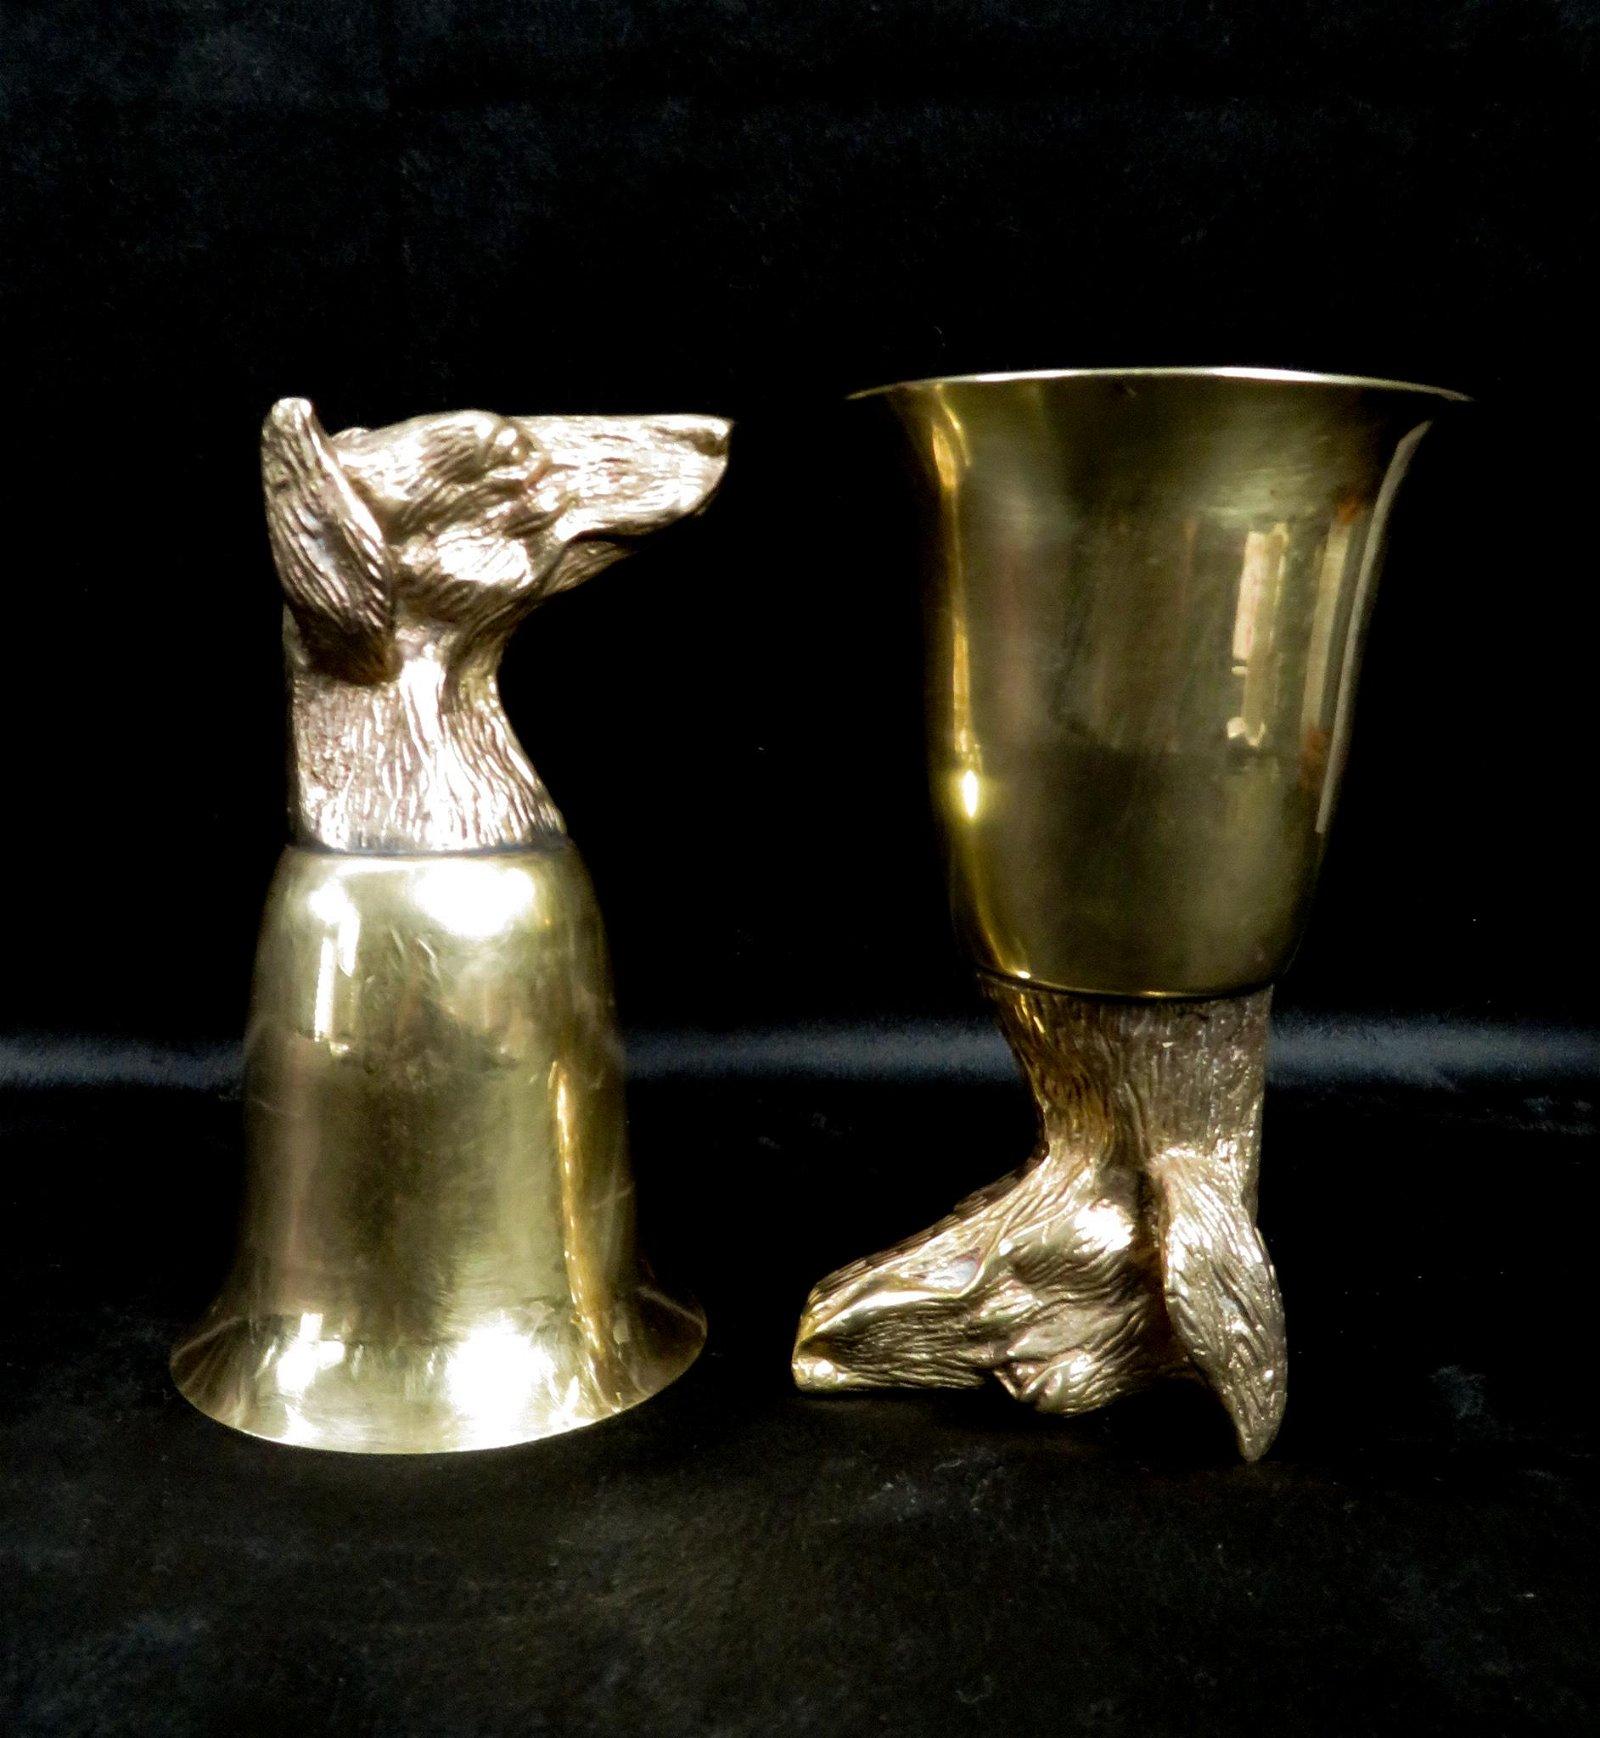 (2) Vintage Italian Hound Dog Stirrup Cups